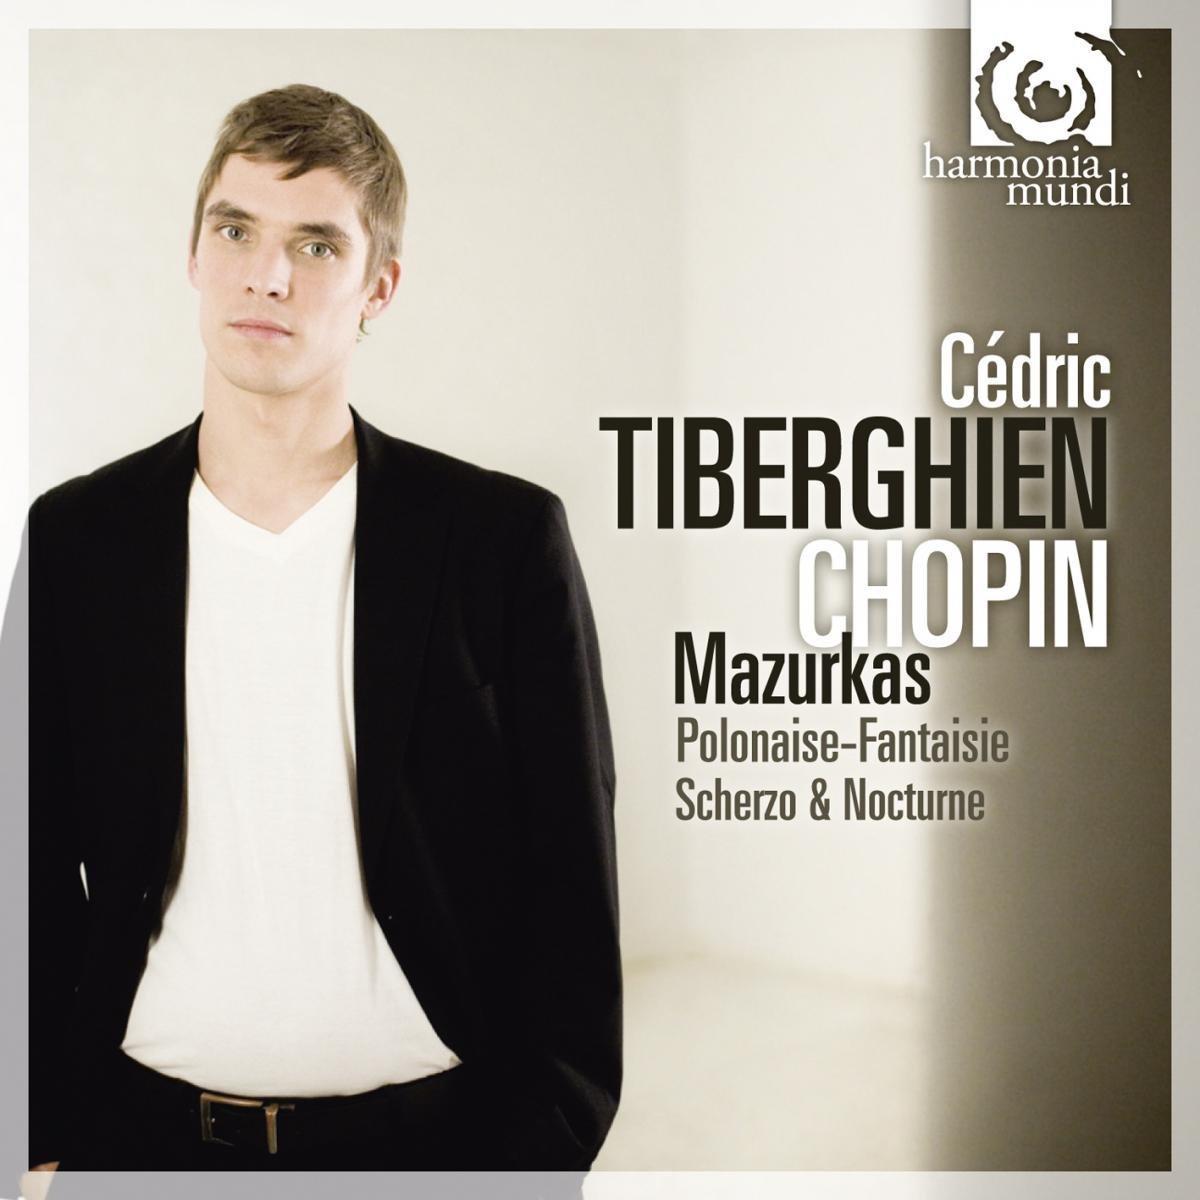 Chopin: Mazurkas & Other Piano Works